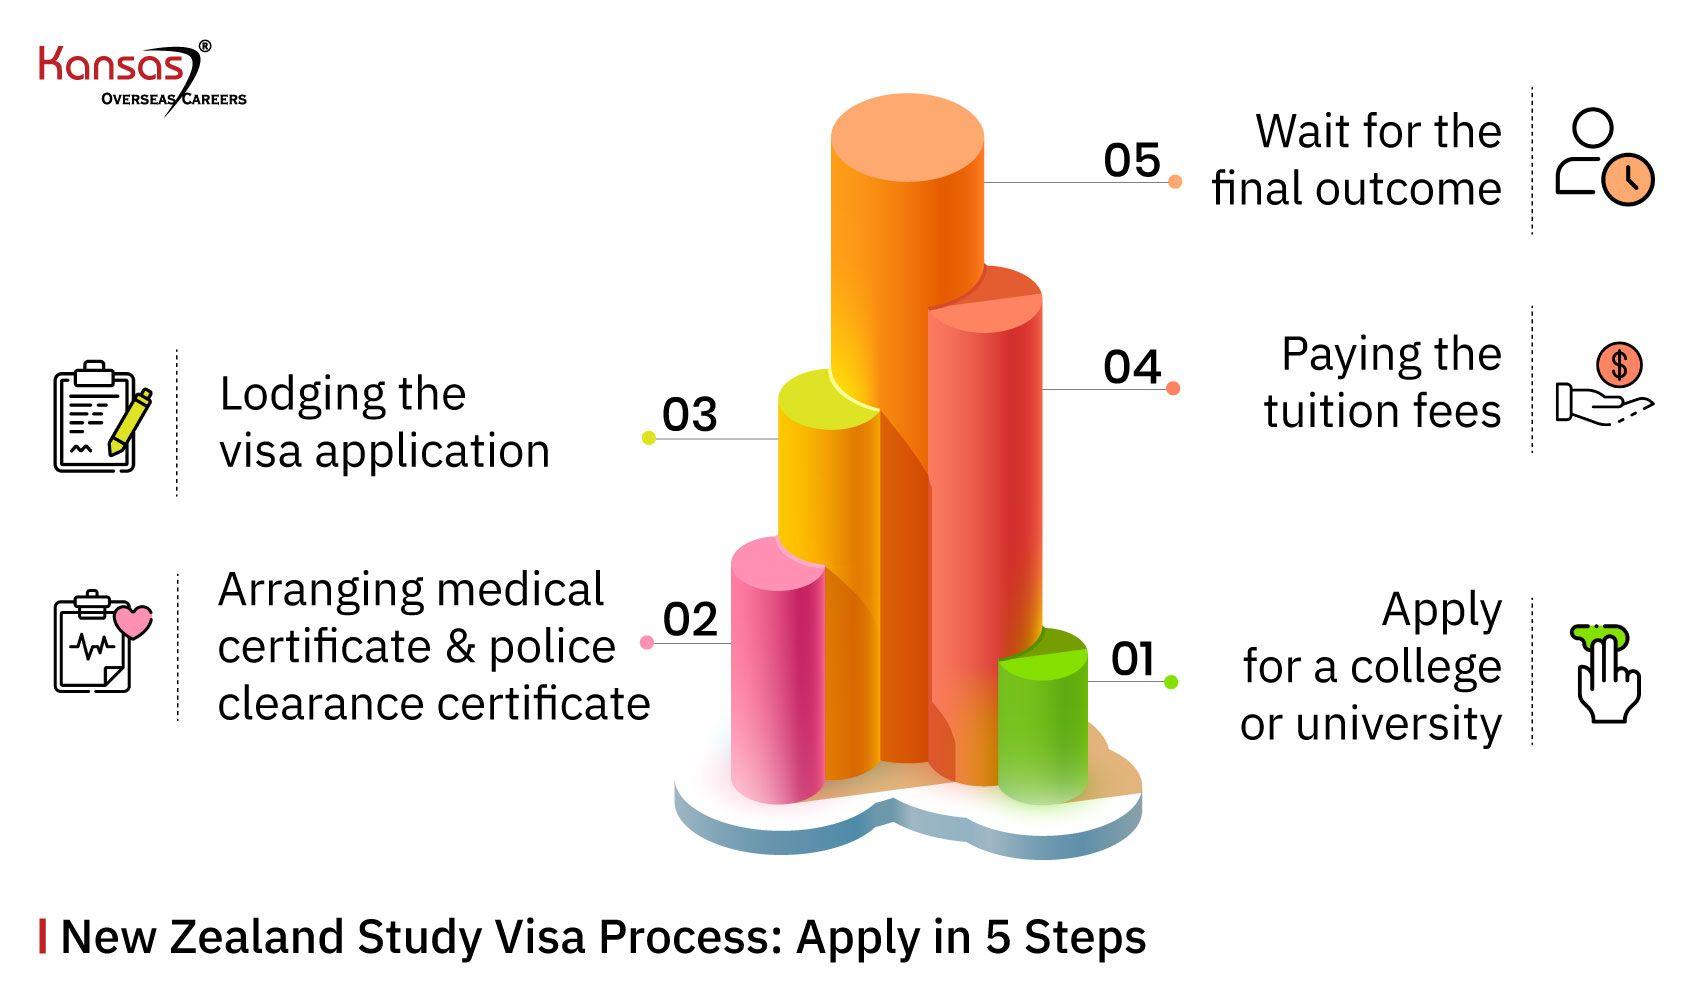 New-Zealand-Study-Visa-Process--Apply-in-5-Steps--